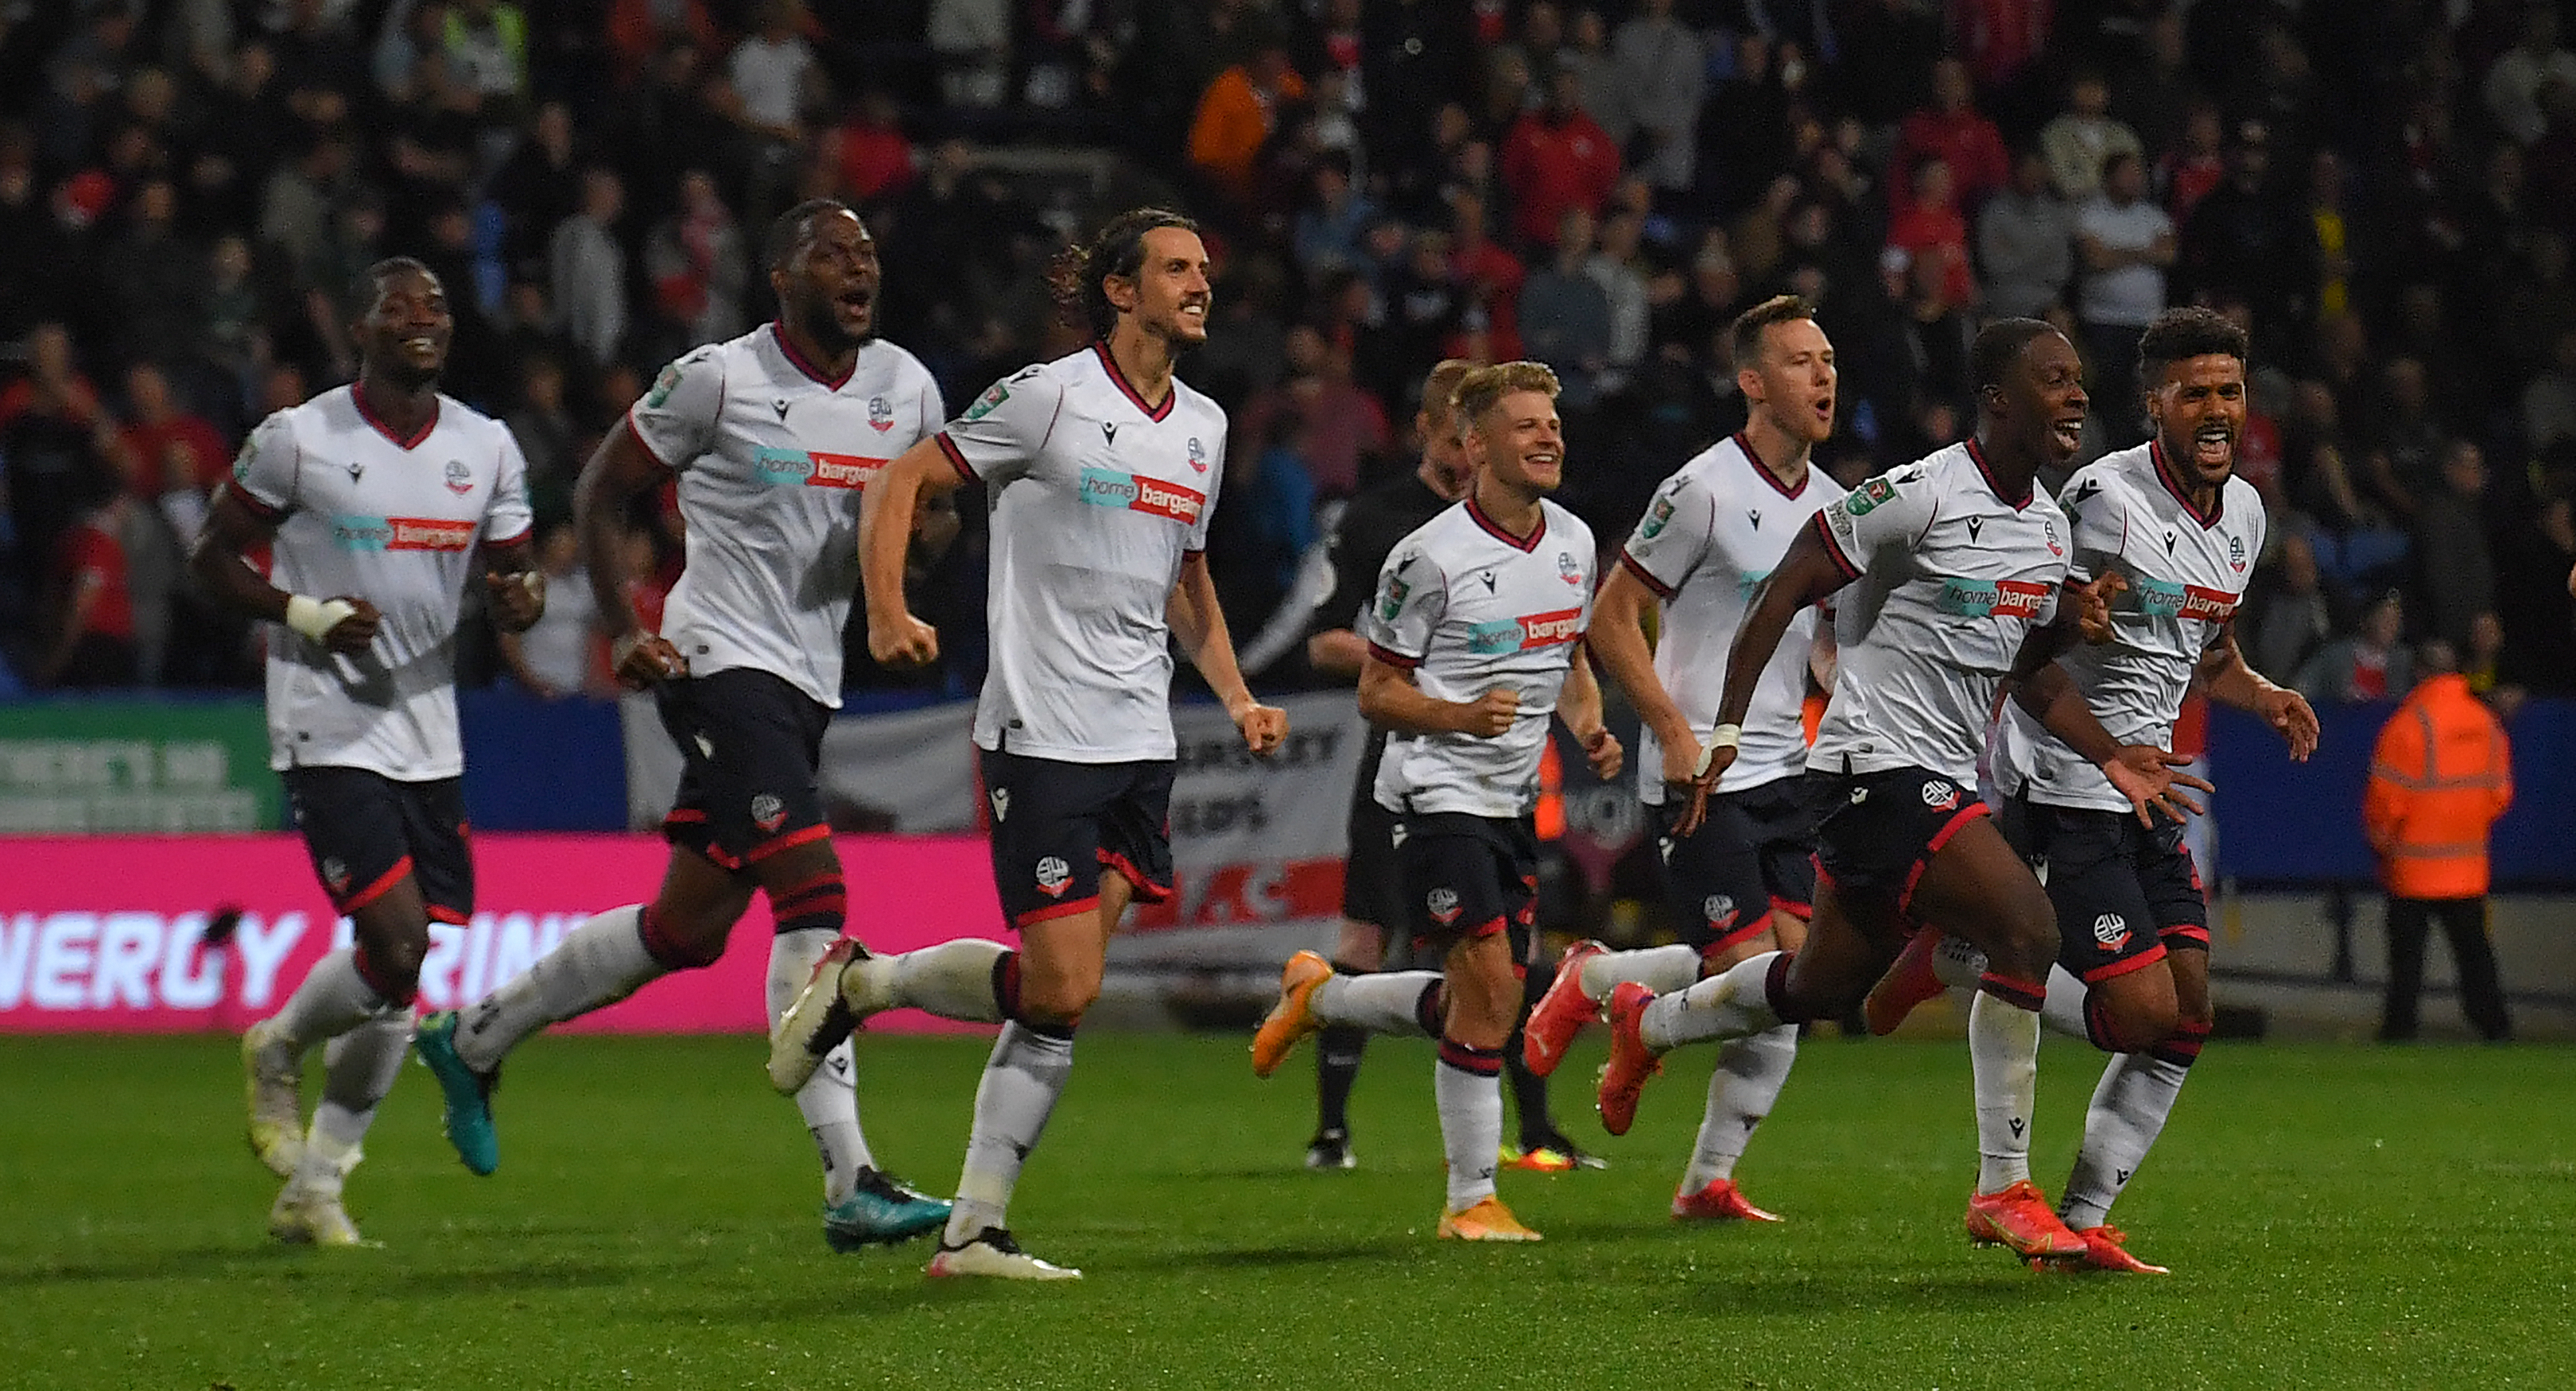 Bolton Wanderers v Barnsley - Carabao Cup First Round